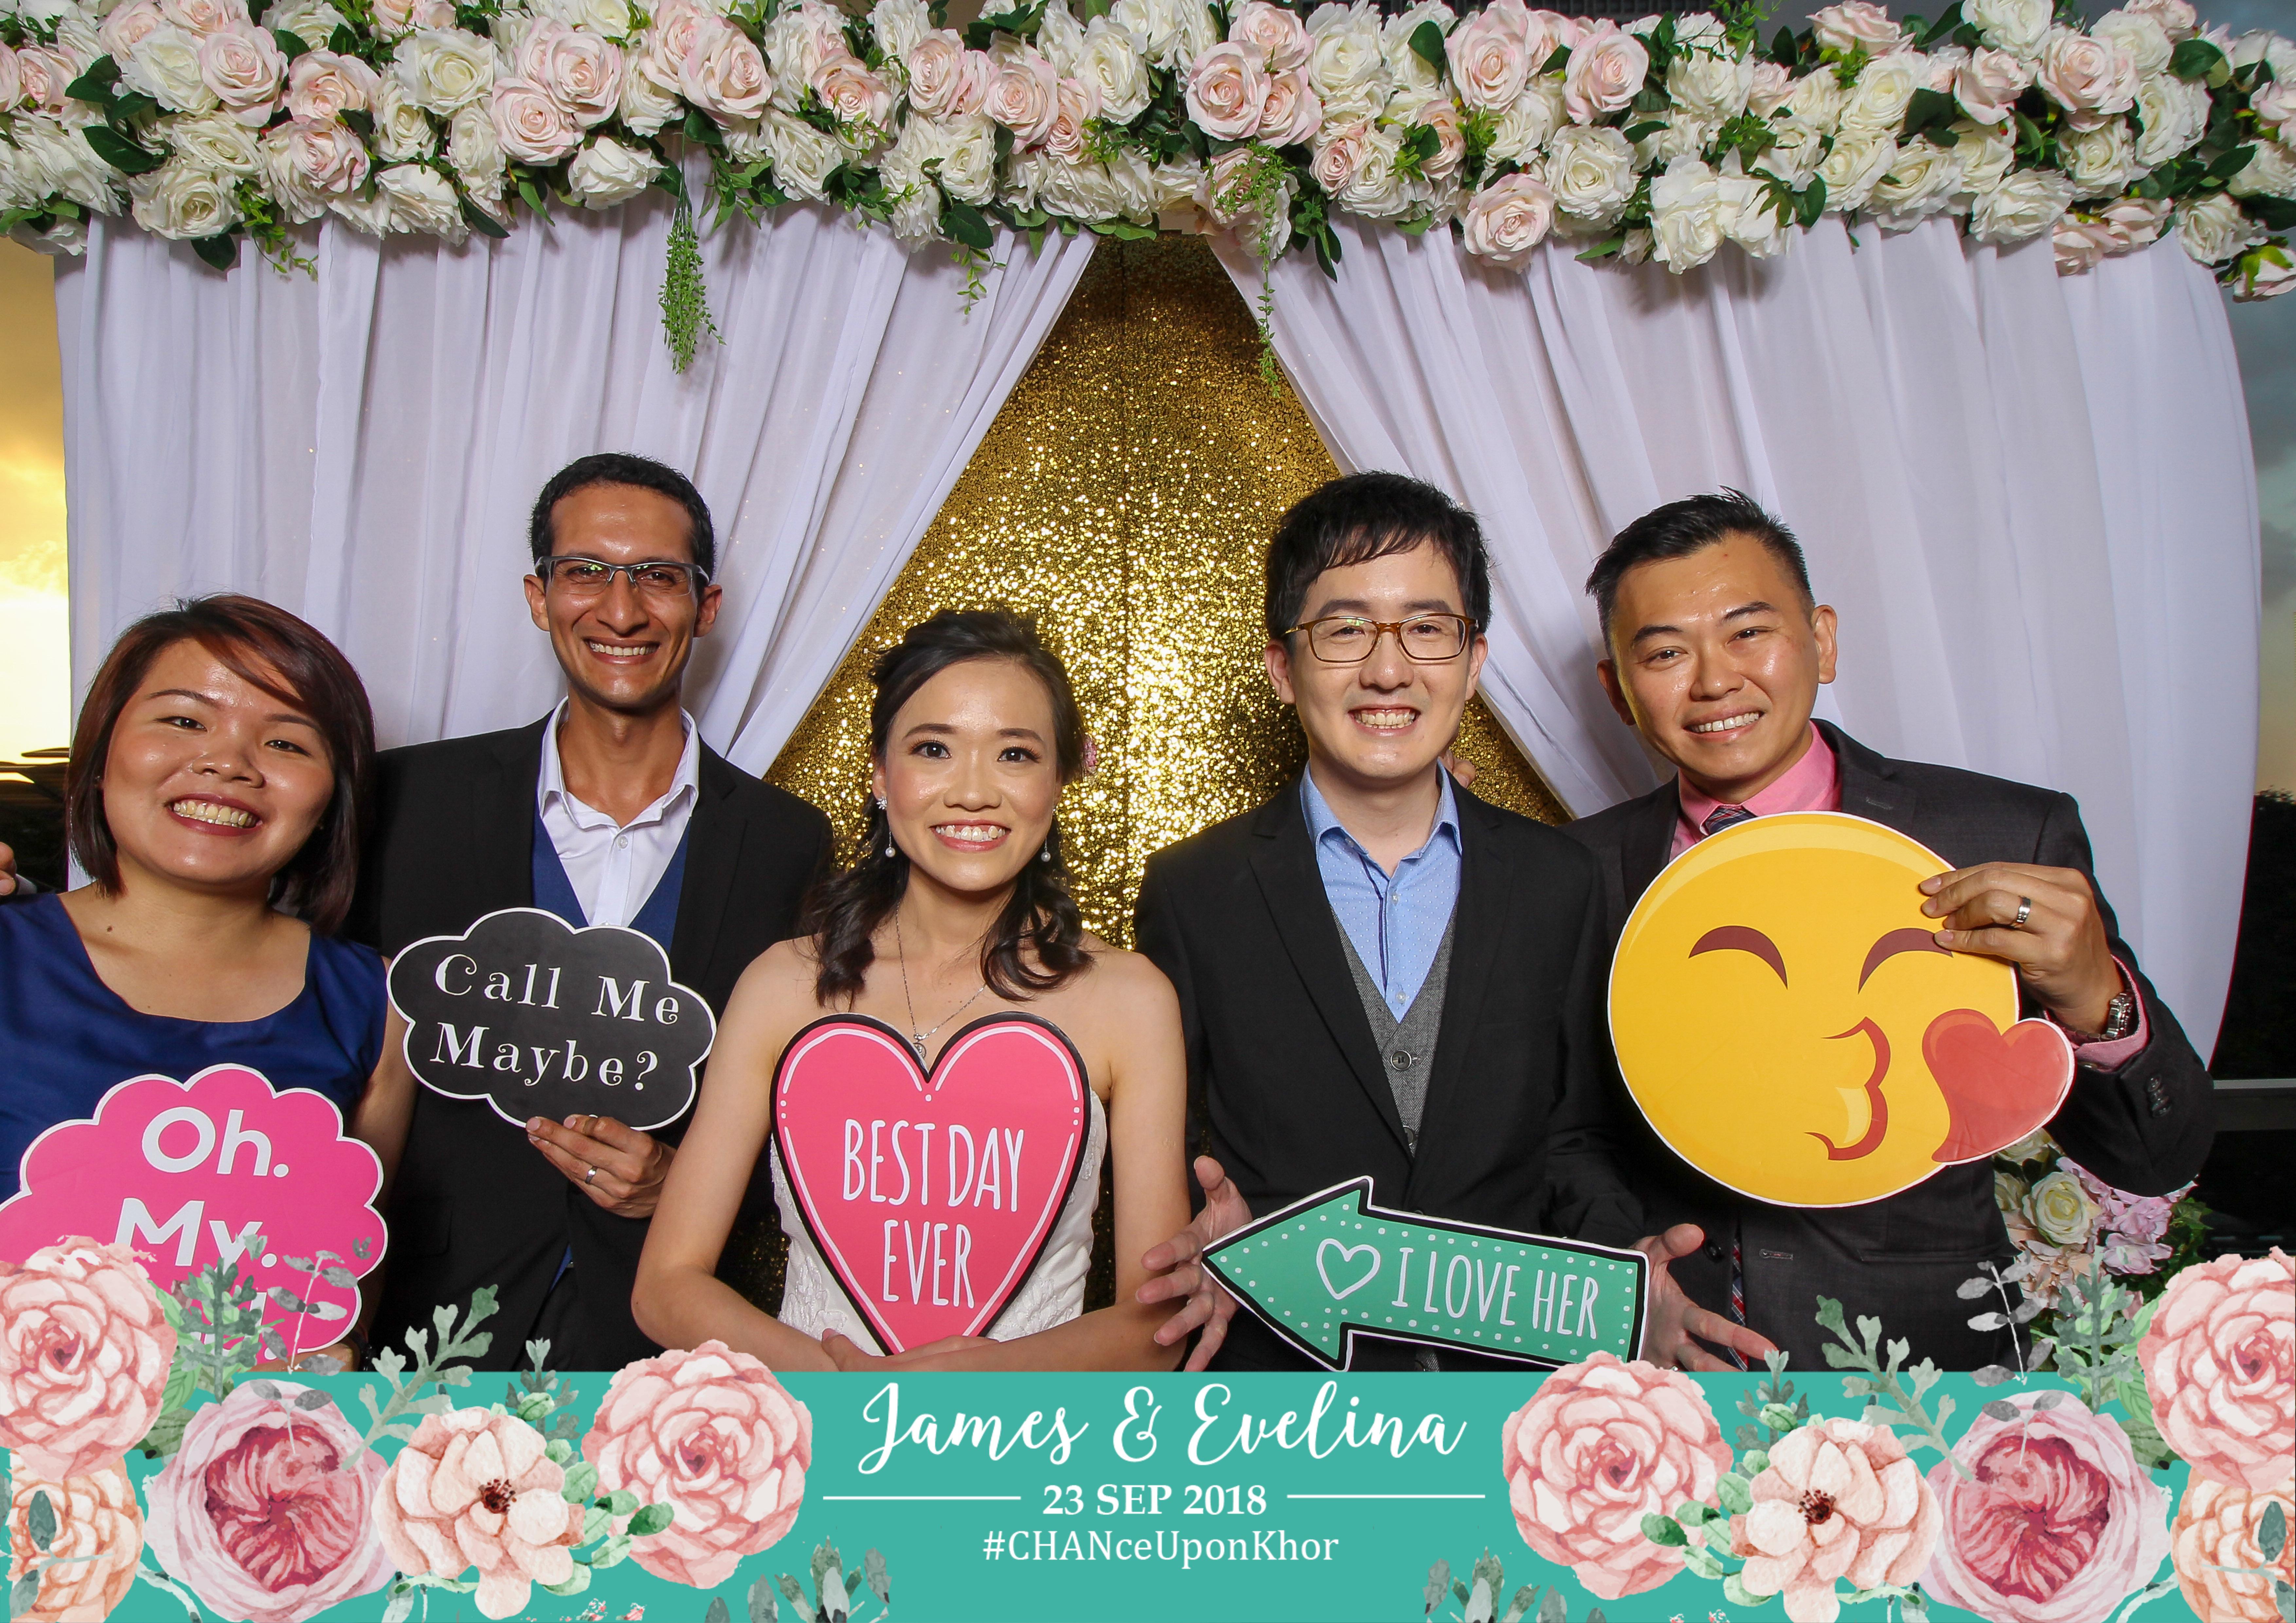 wedding photo booth singapore-61